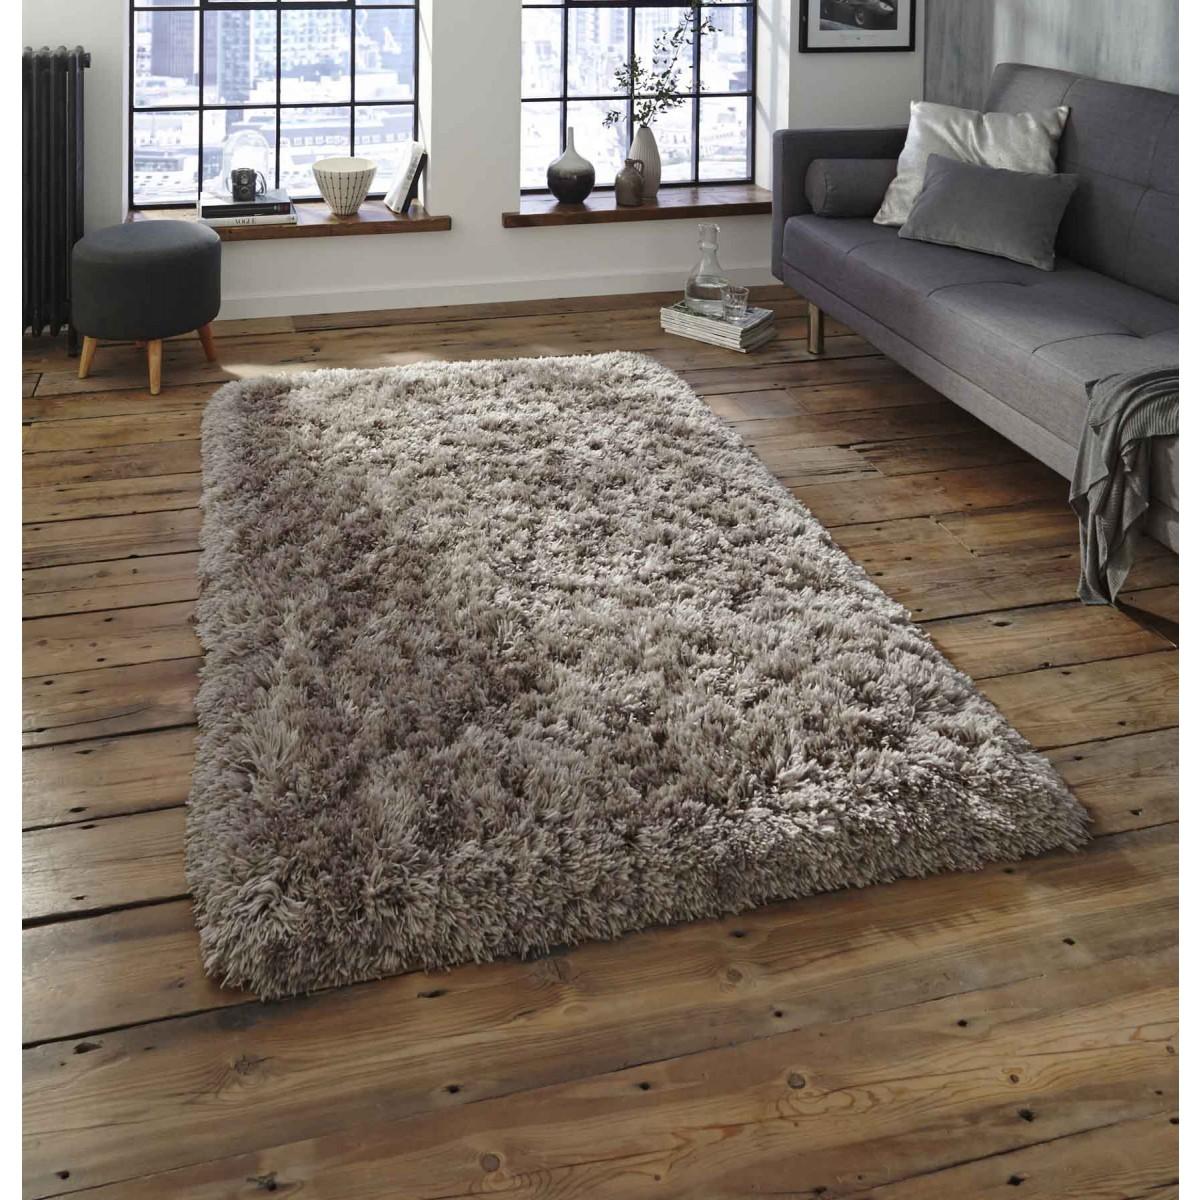 shaggy rugs buy polar pl95 grey thick shaggy rug|therugshopuk UVKGVSE